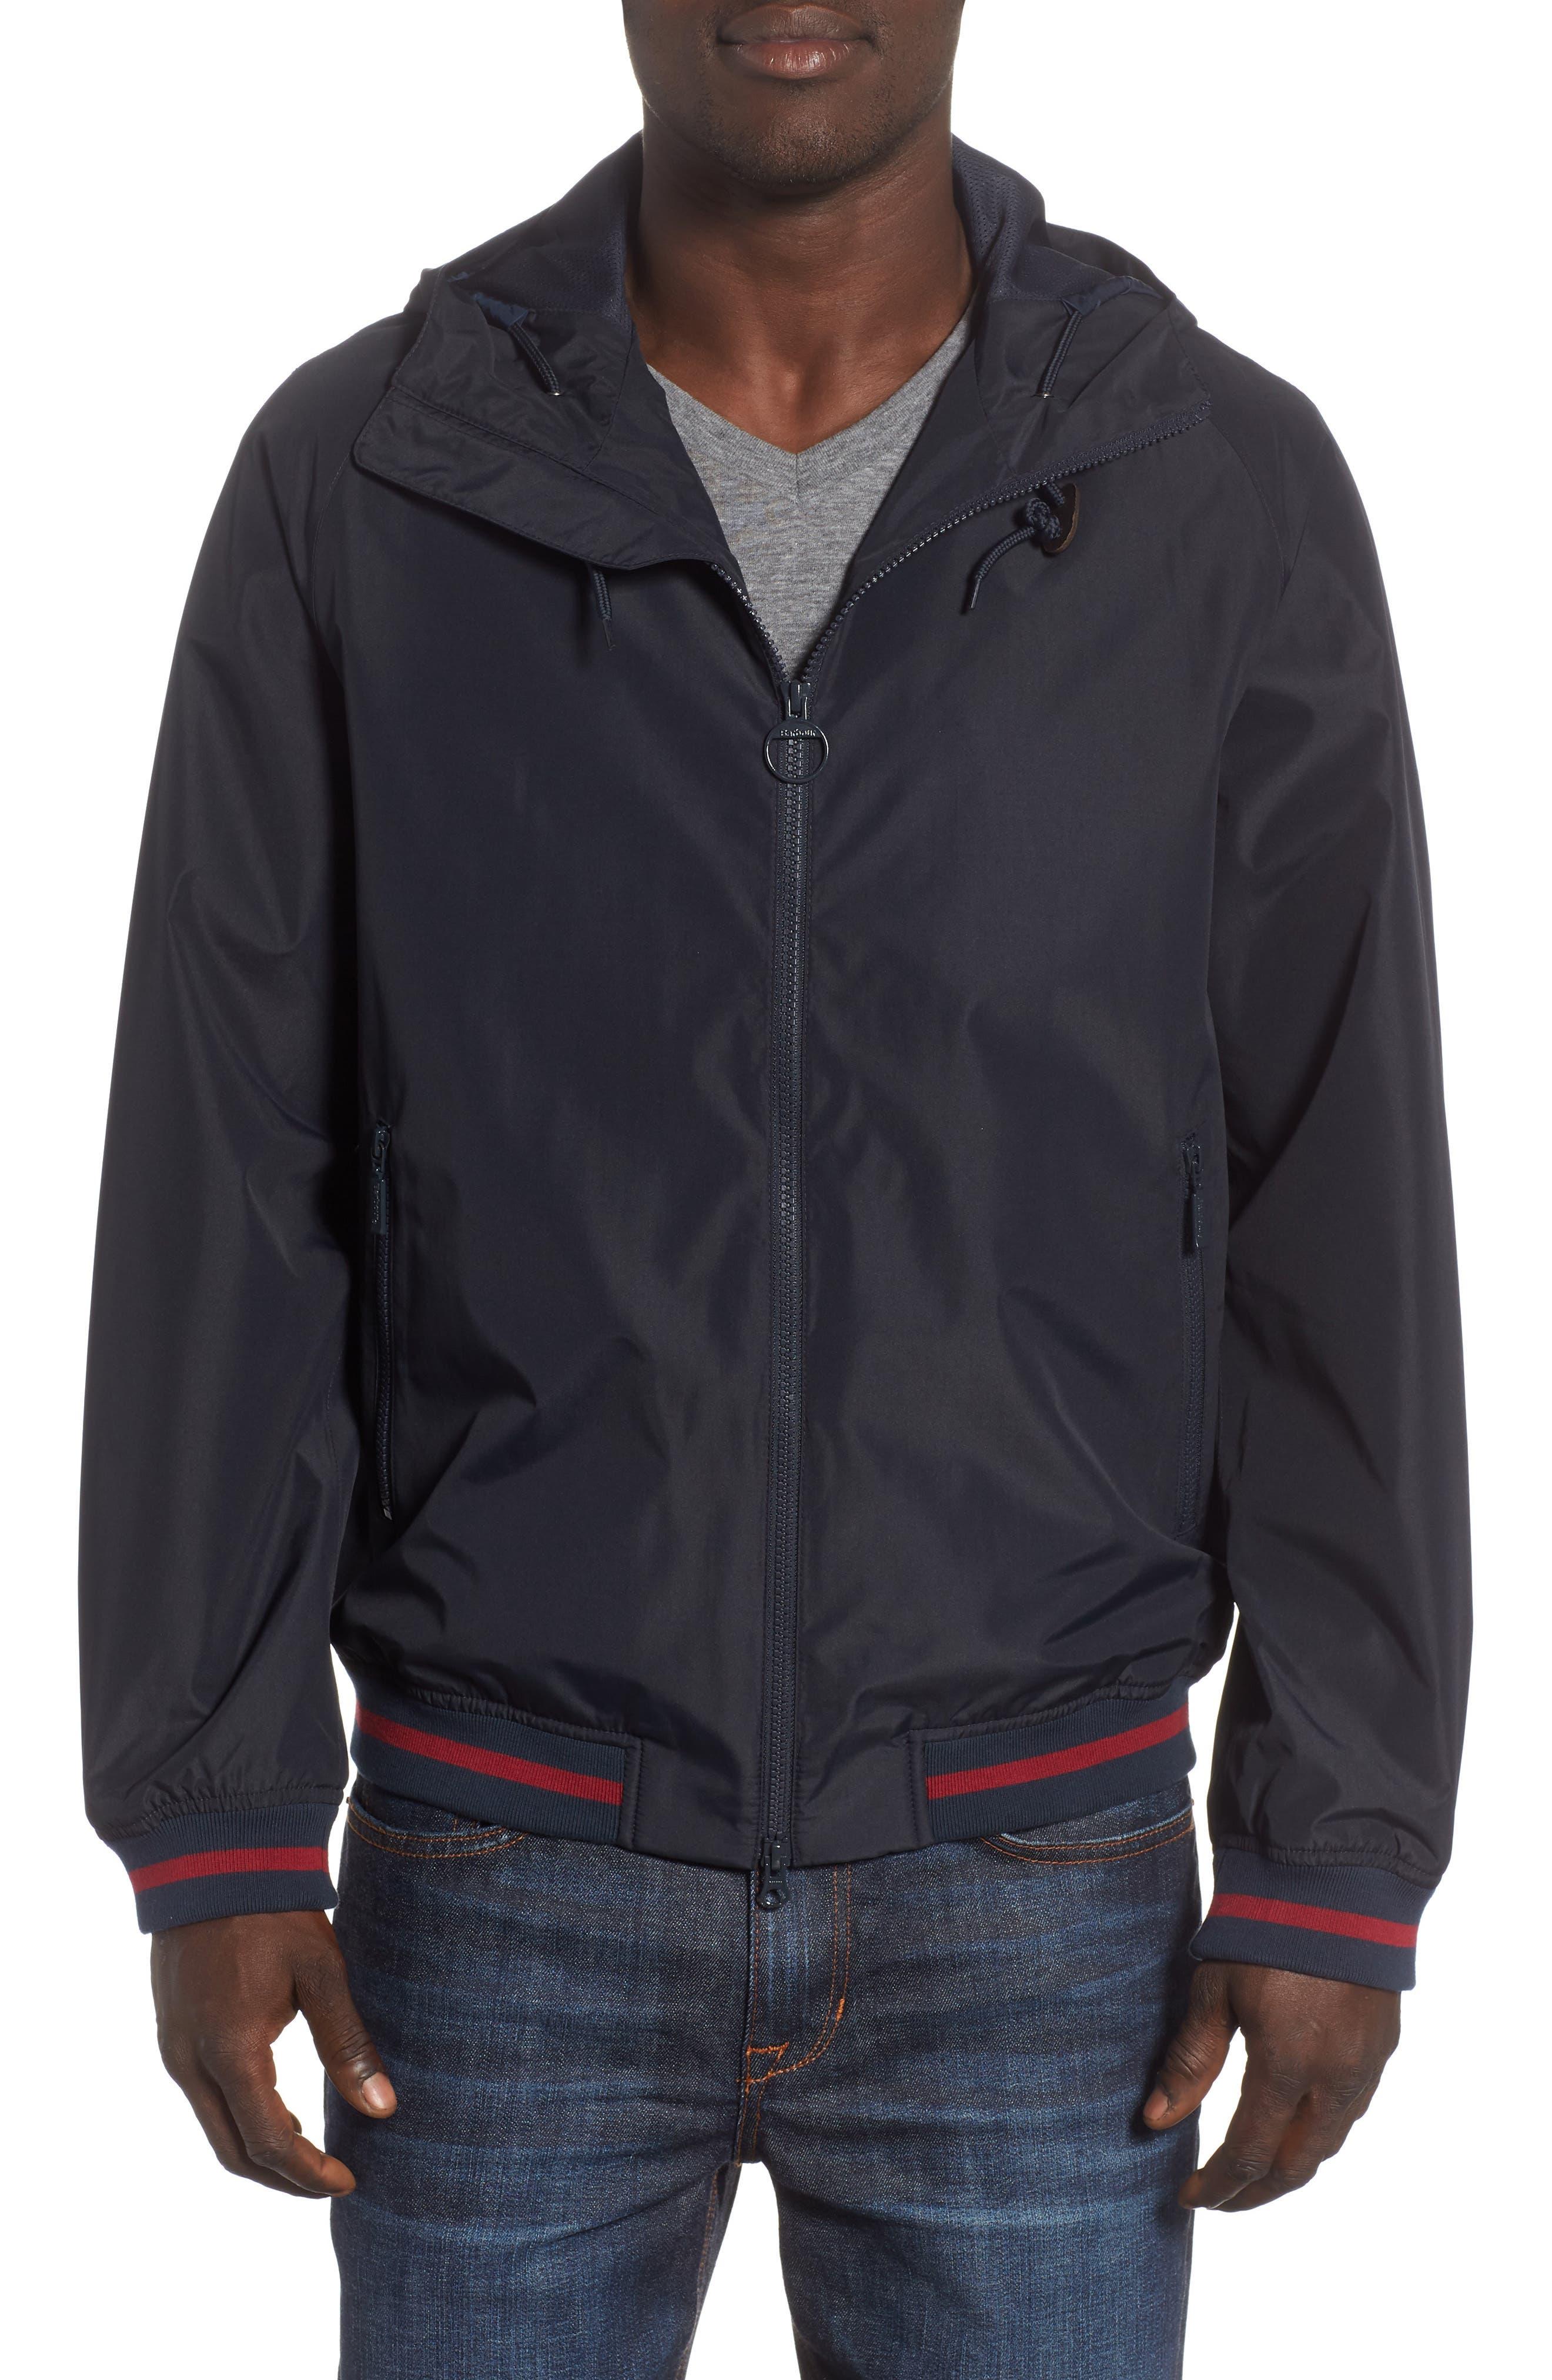 Twent Waterproof Jacket,                             Main thumbnail 1, color,                             410